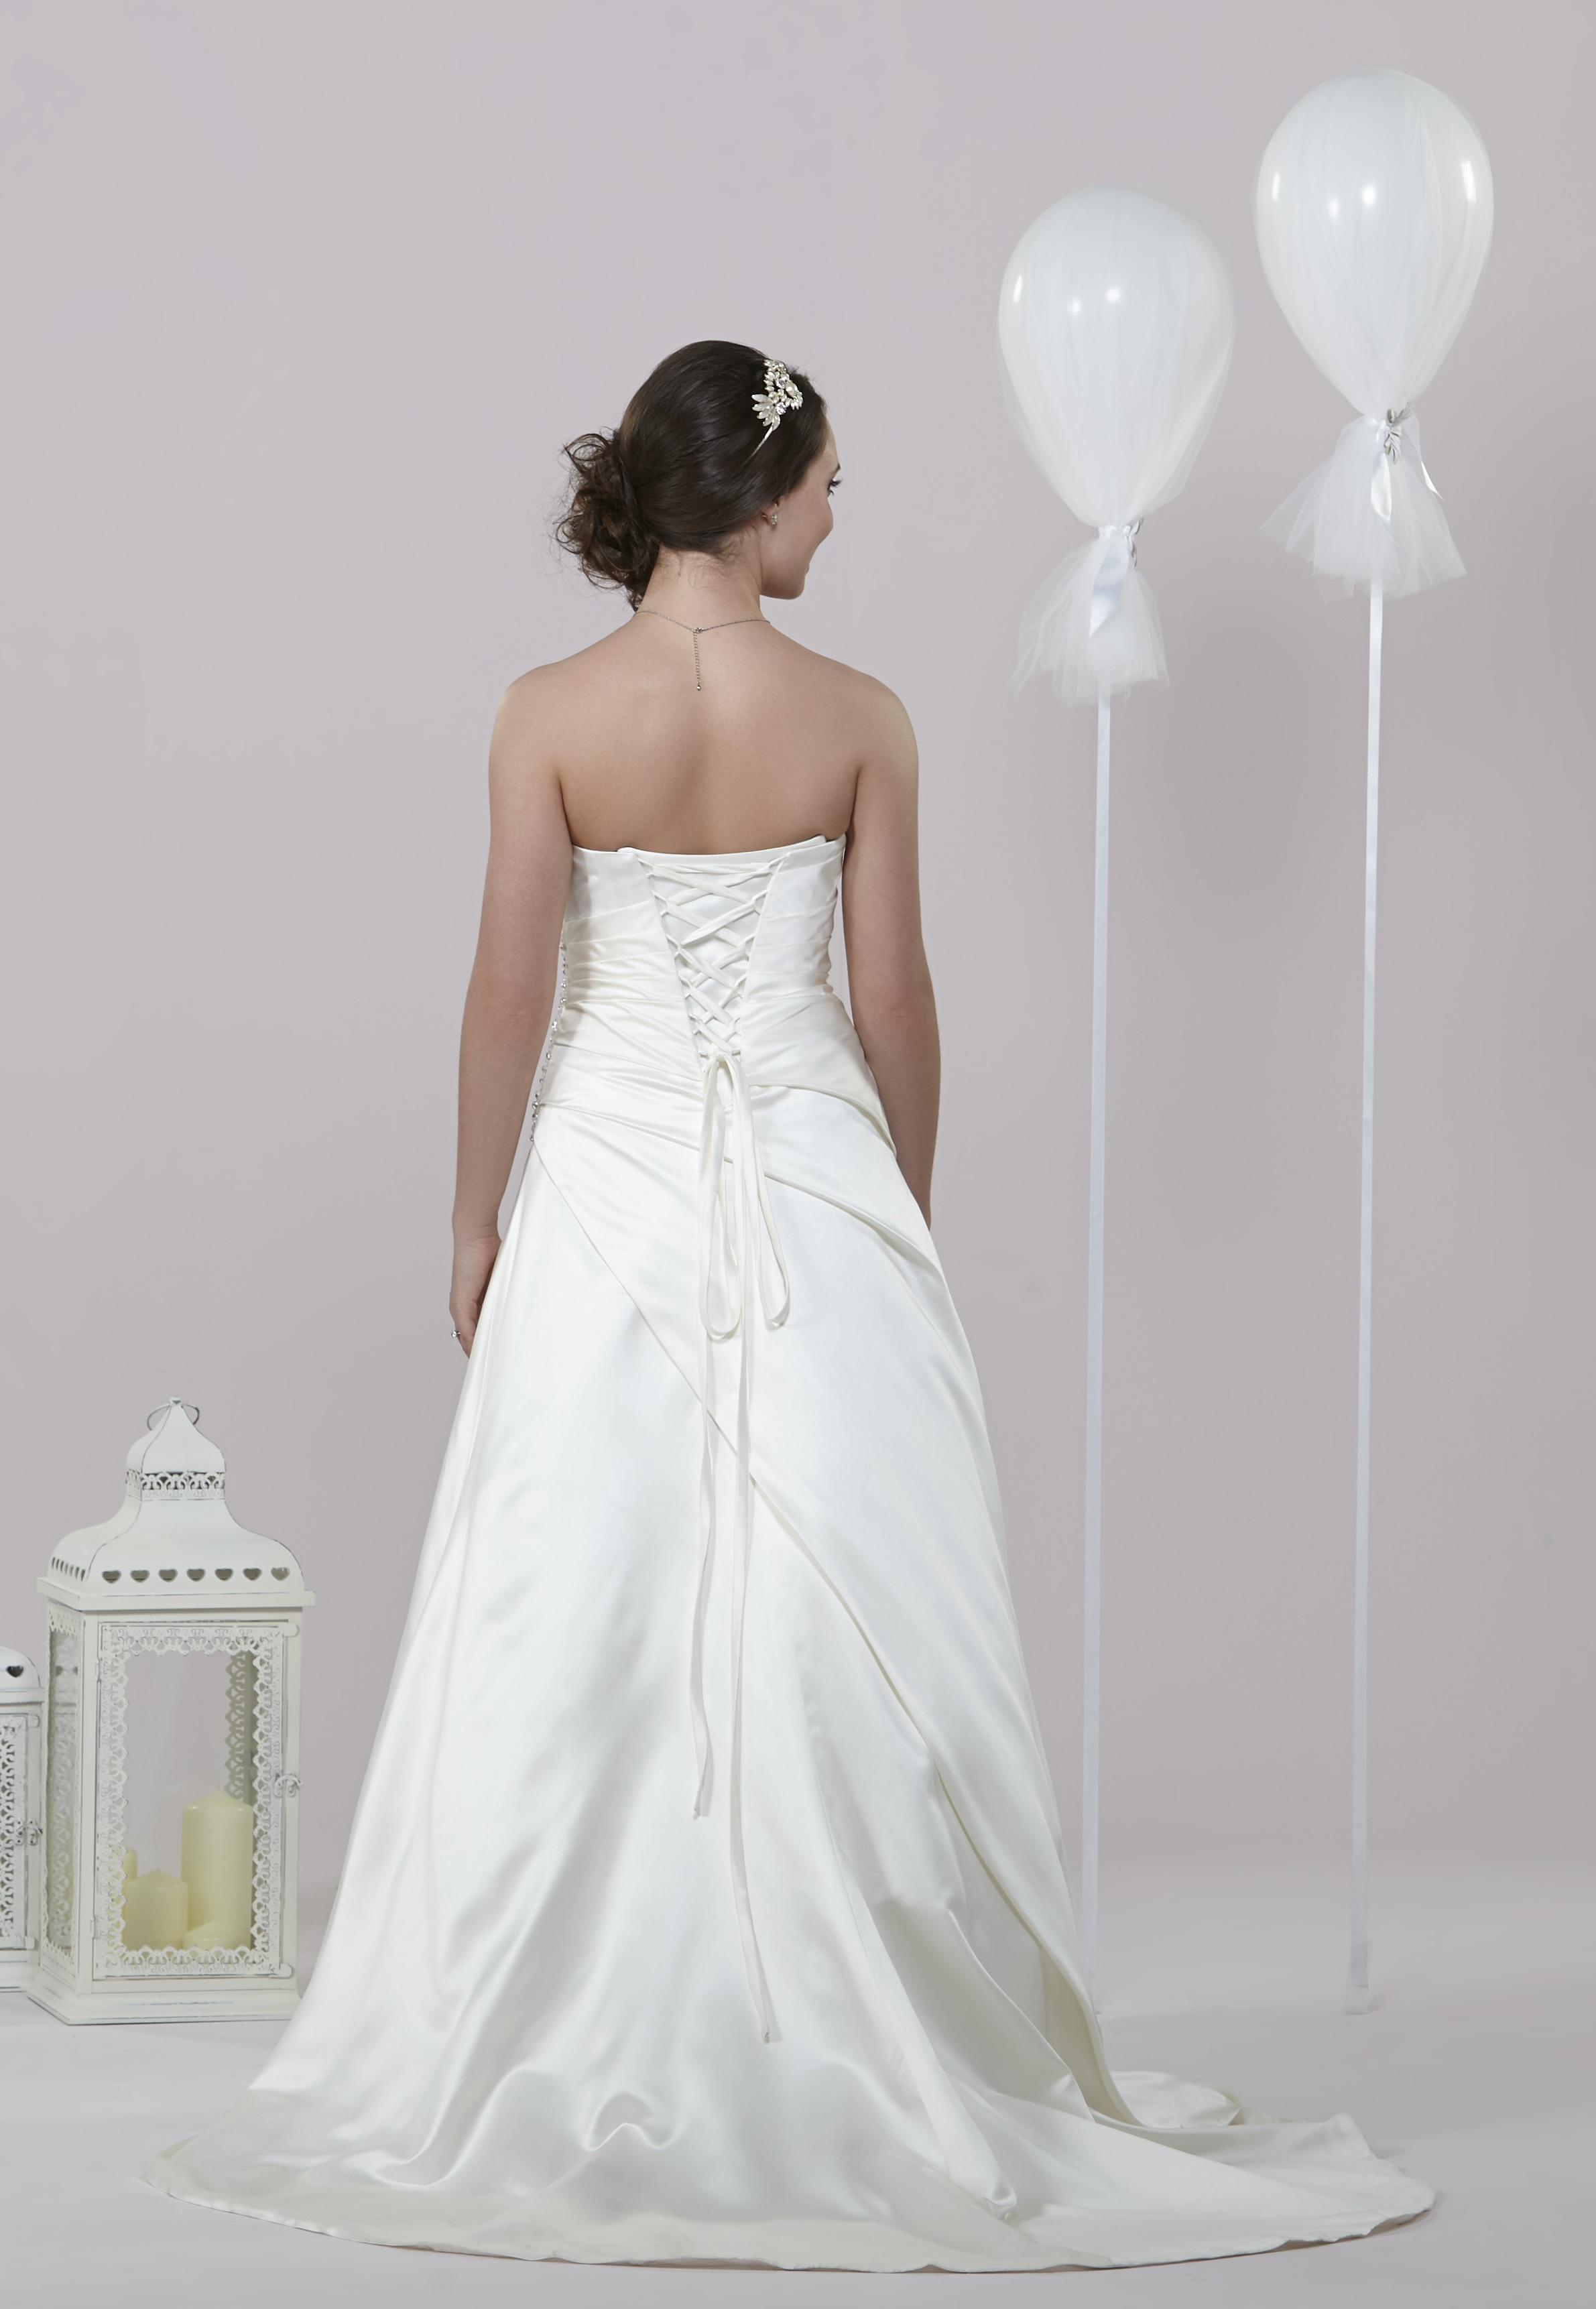 Daisy By Alexia Wedding Dresses MIRFIELD WEST YORKSHIRE